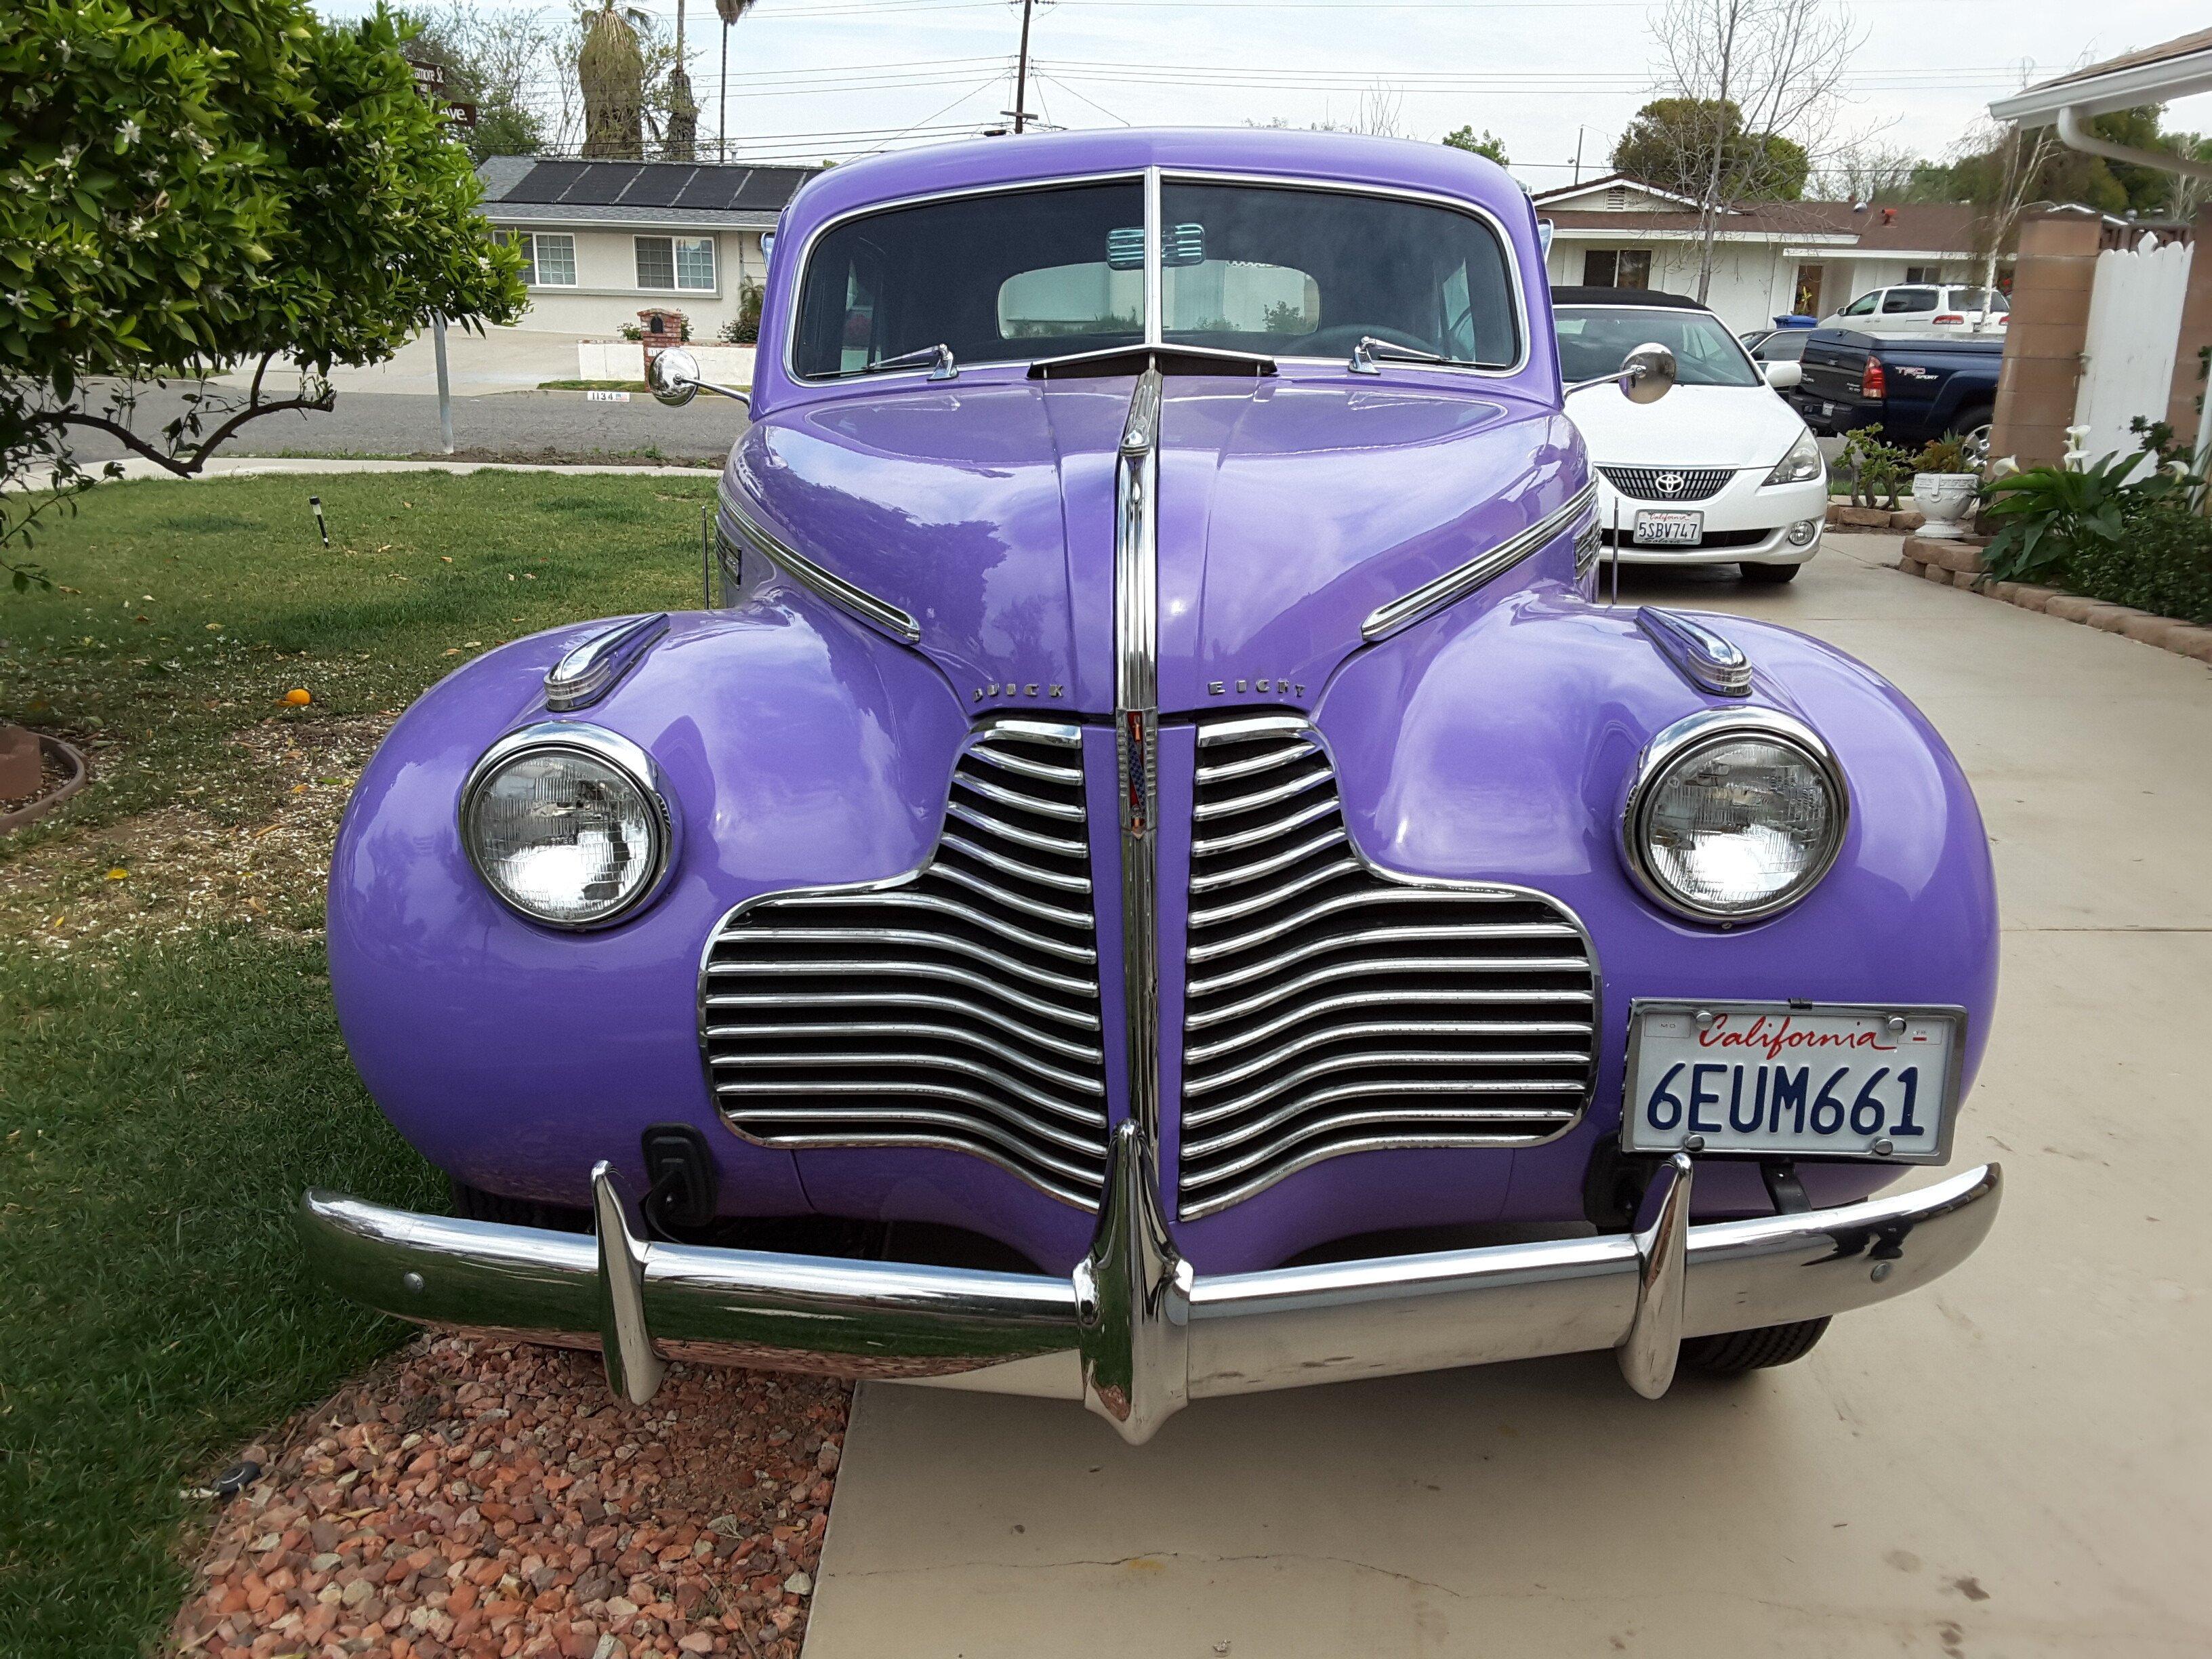 1940 Buick Super antiques Car 100767837 8613c8b581227664da52930db9c9b0ad?r=fit&w=230&s=1 buick classics for sale near ventura, california classics on 1940 buick wiring harness at virtualis.co